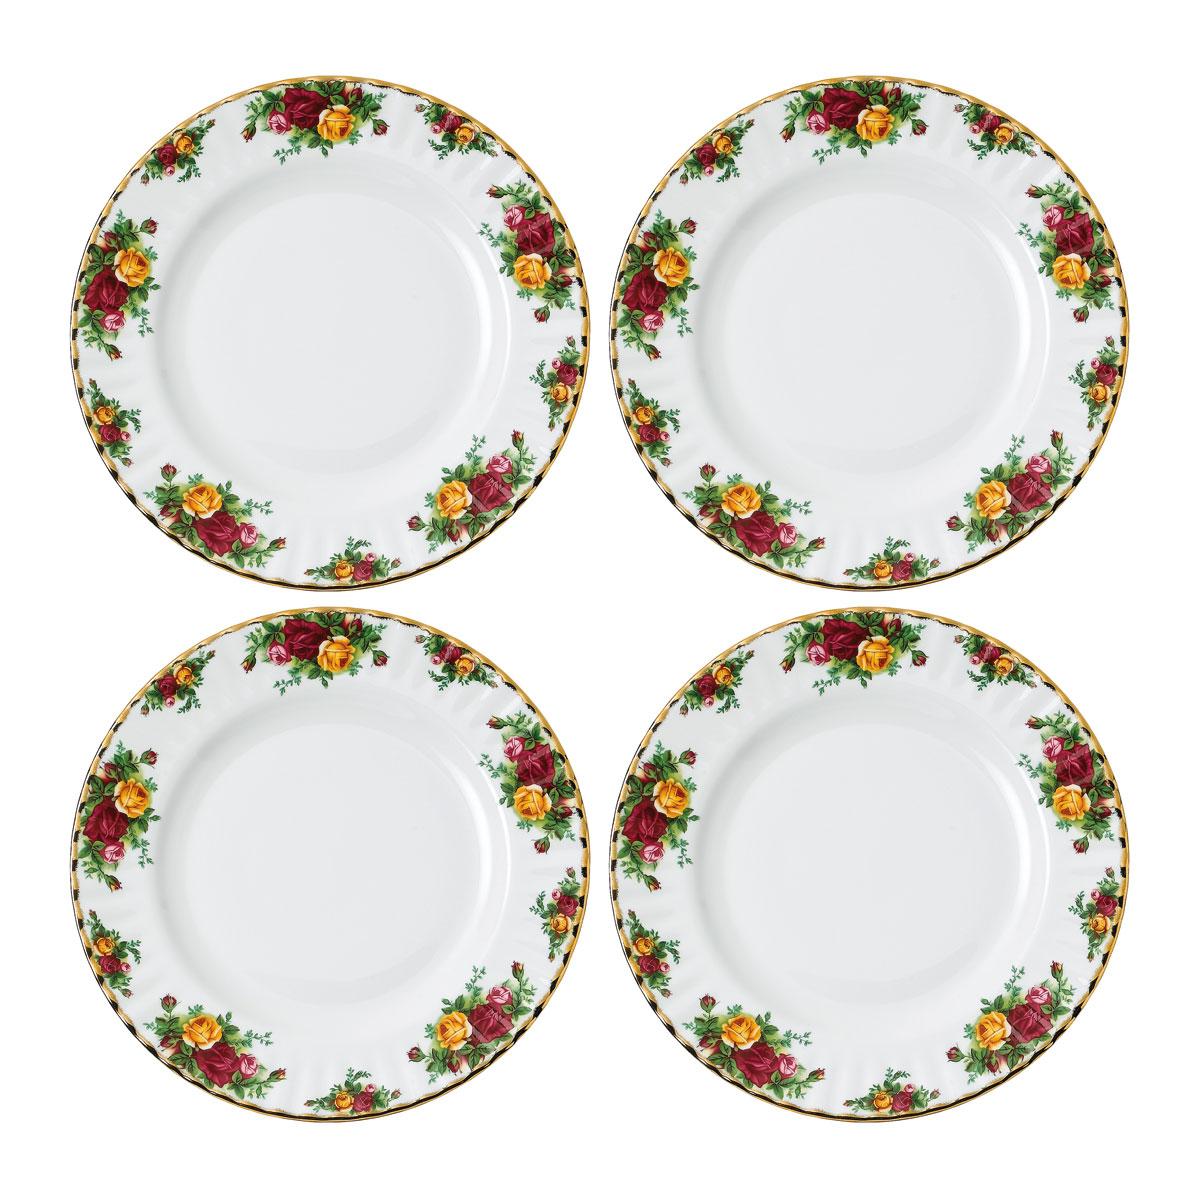 Royal Albert Old Country Roses Dinner Plate Set of 4